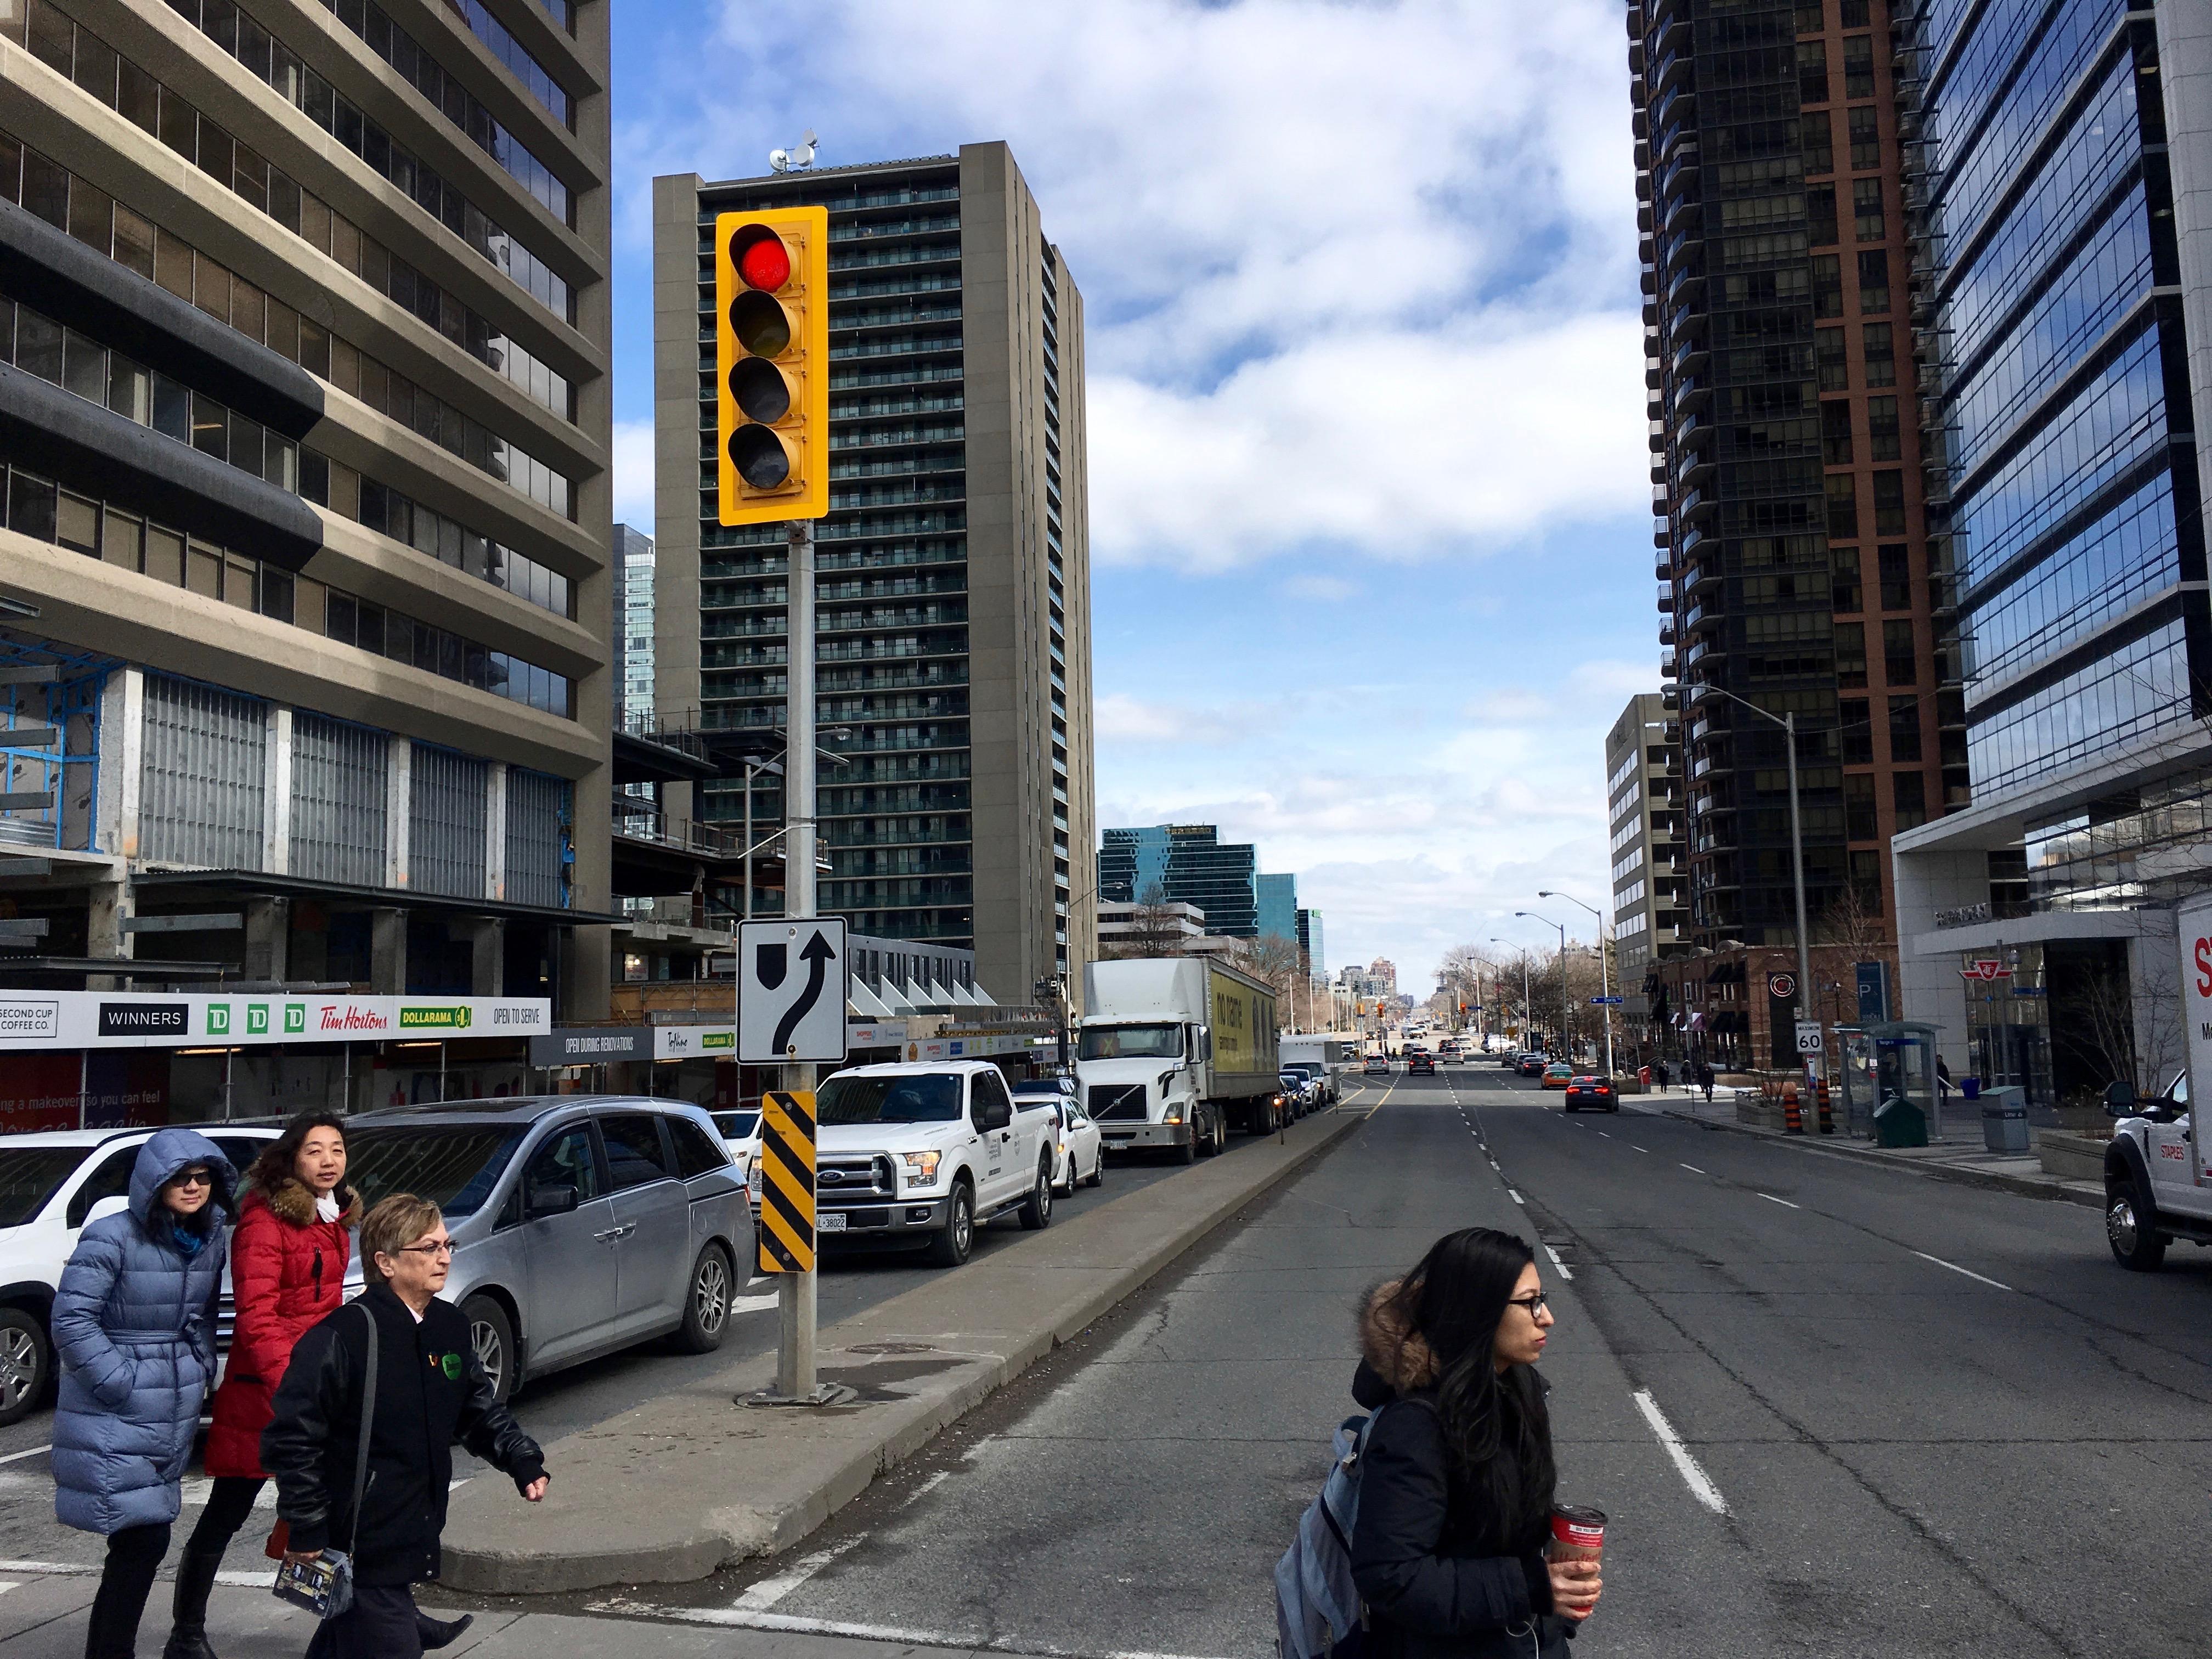 12:01 p.m., March 2, 2018. Pedestrians cross Sheppard Avenue, east of Yonge, where Doris Avenue starts.